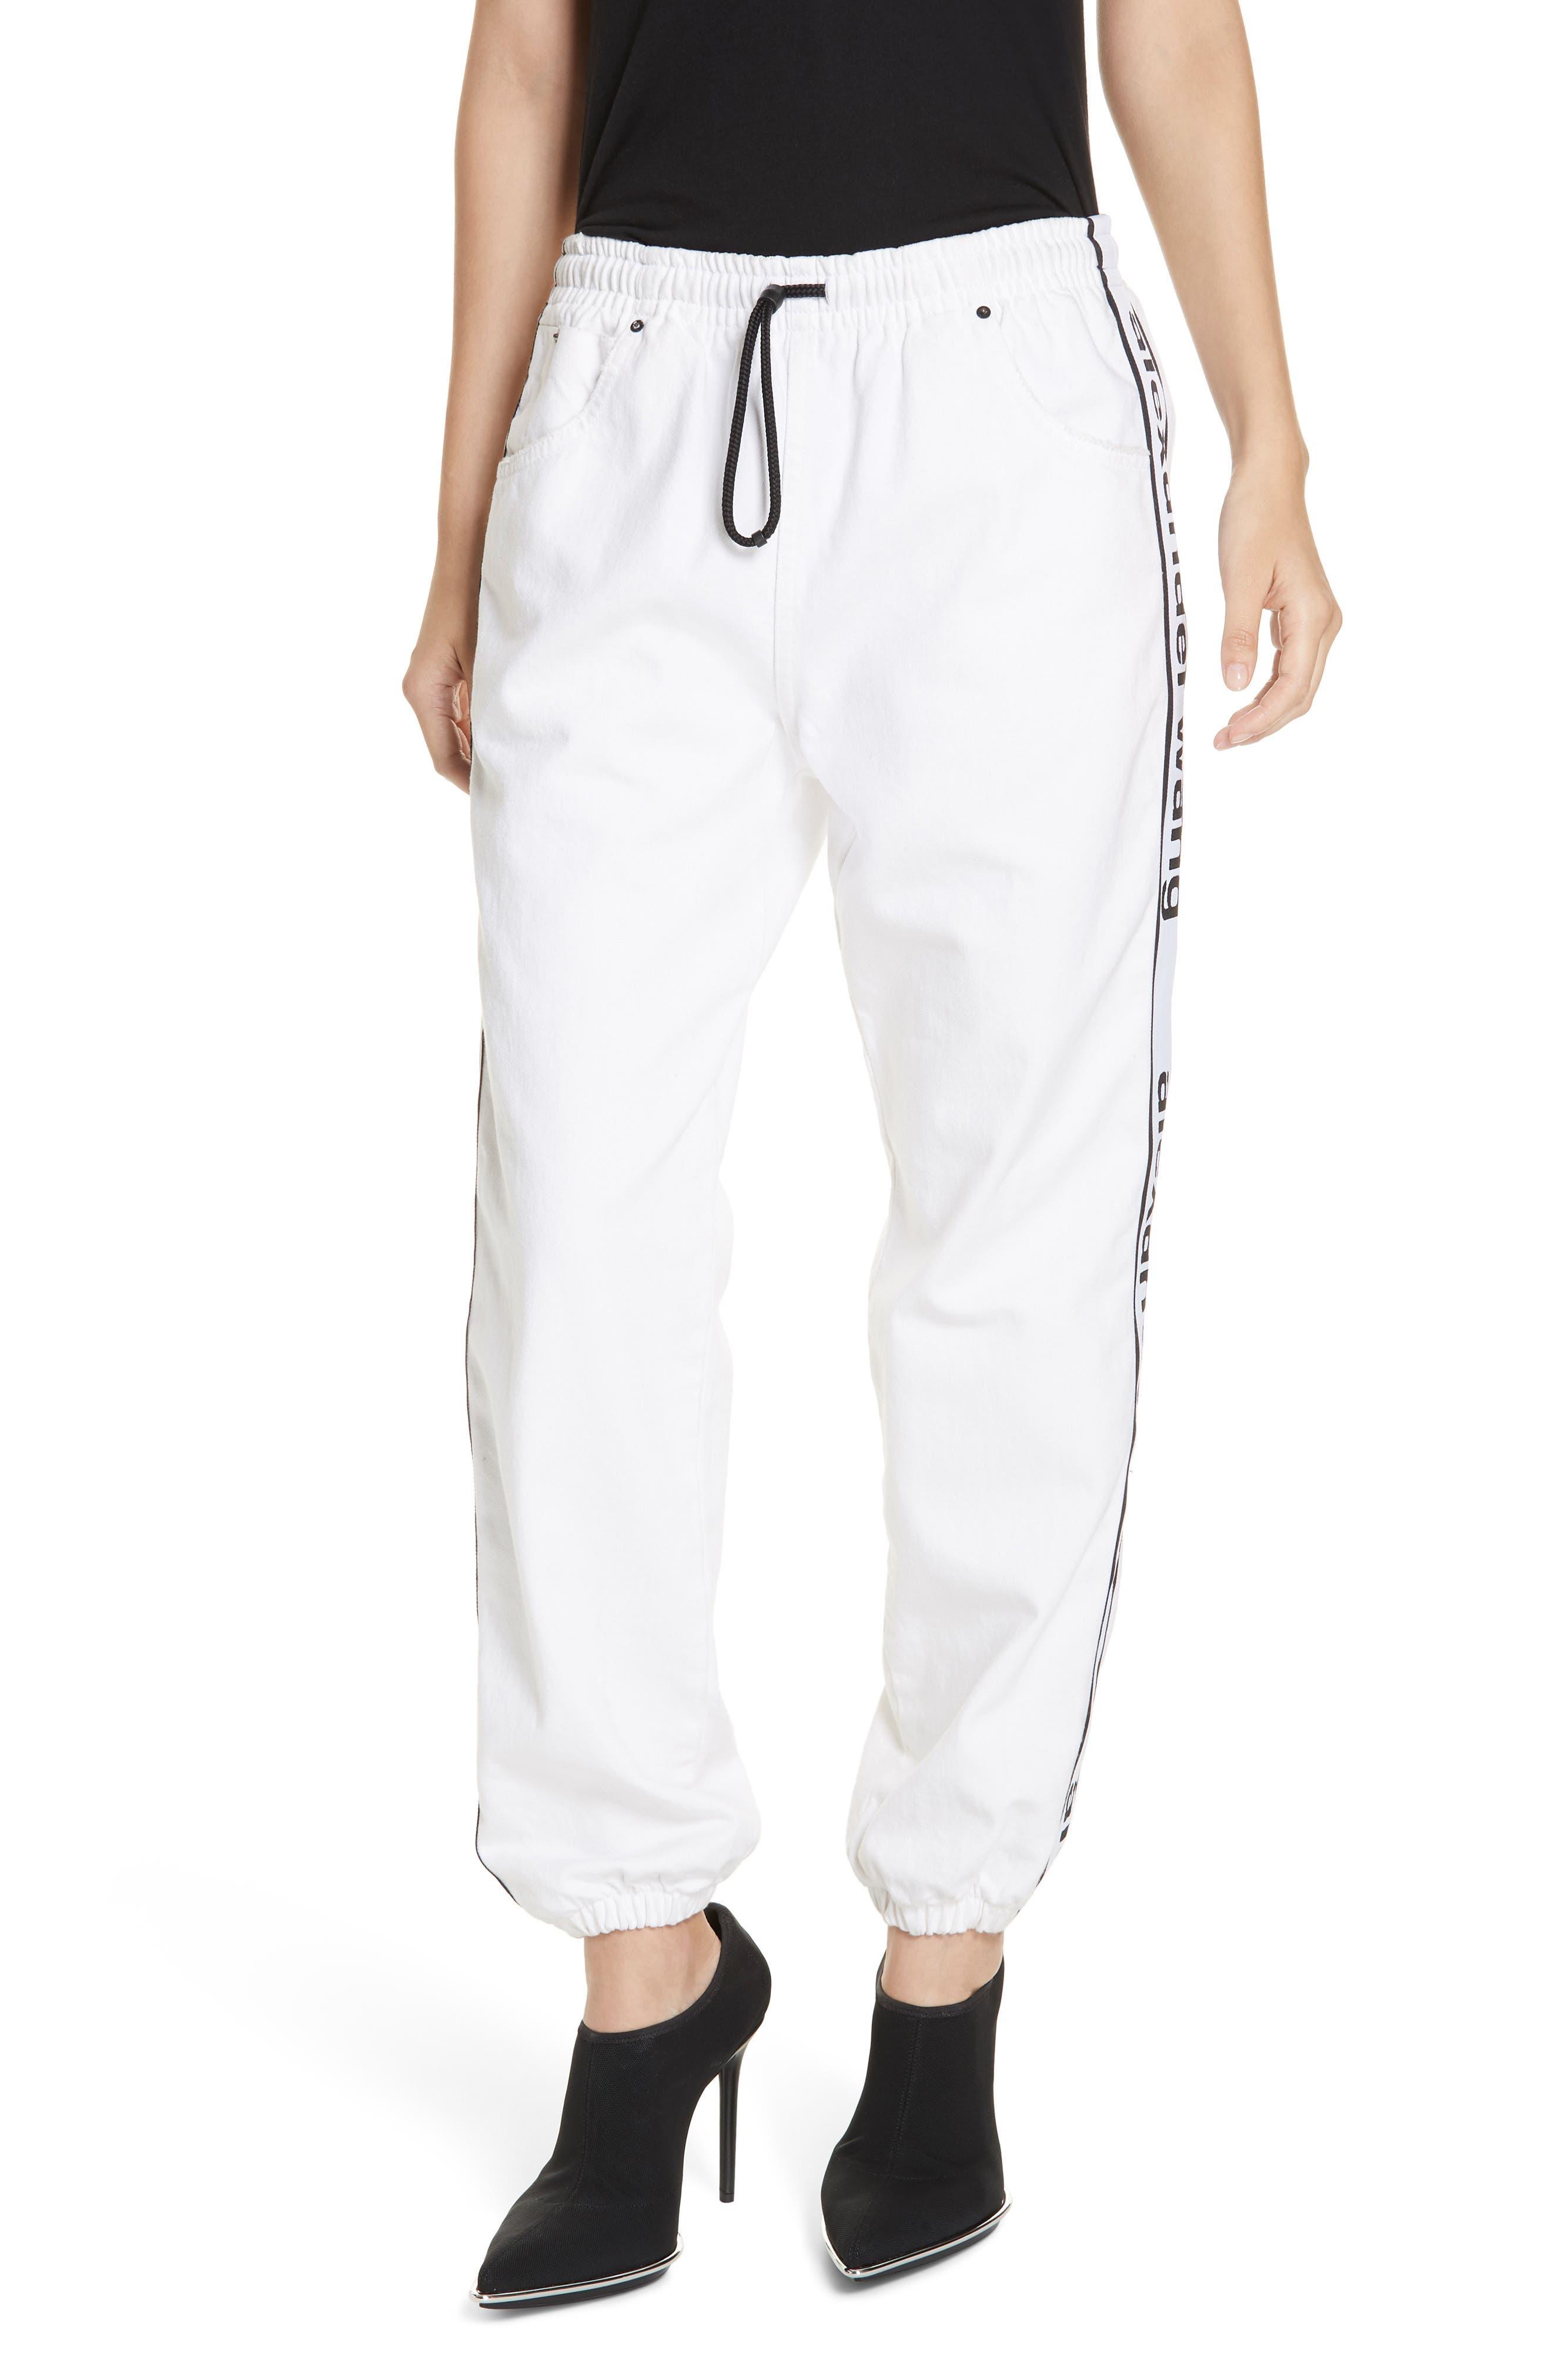 ALEXANDERWANG.T, Logo Stripe Track Pants, Main thumbnail 1, color, OPTIC WHITE